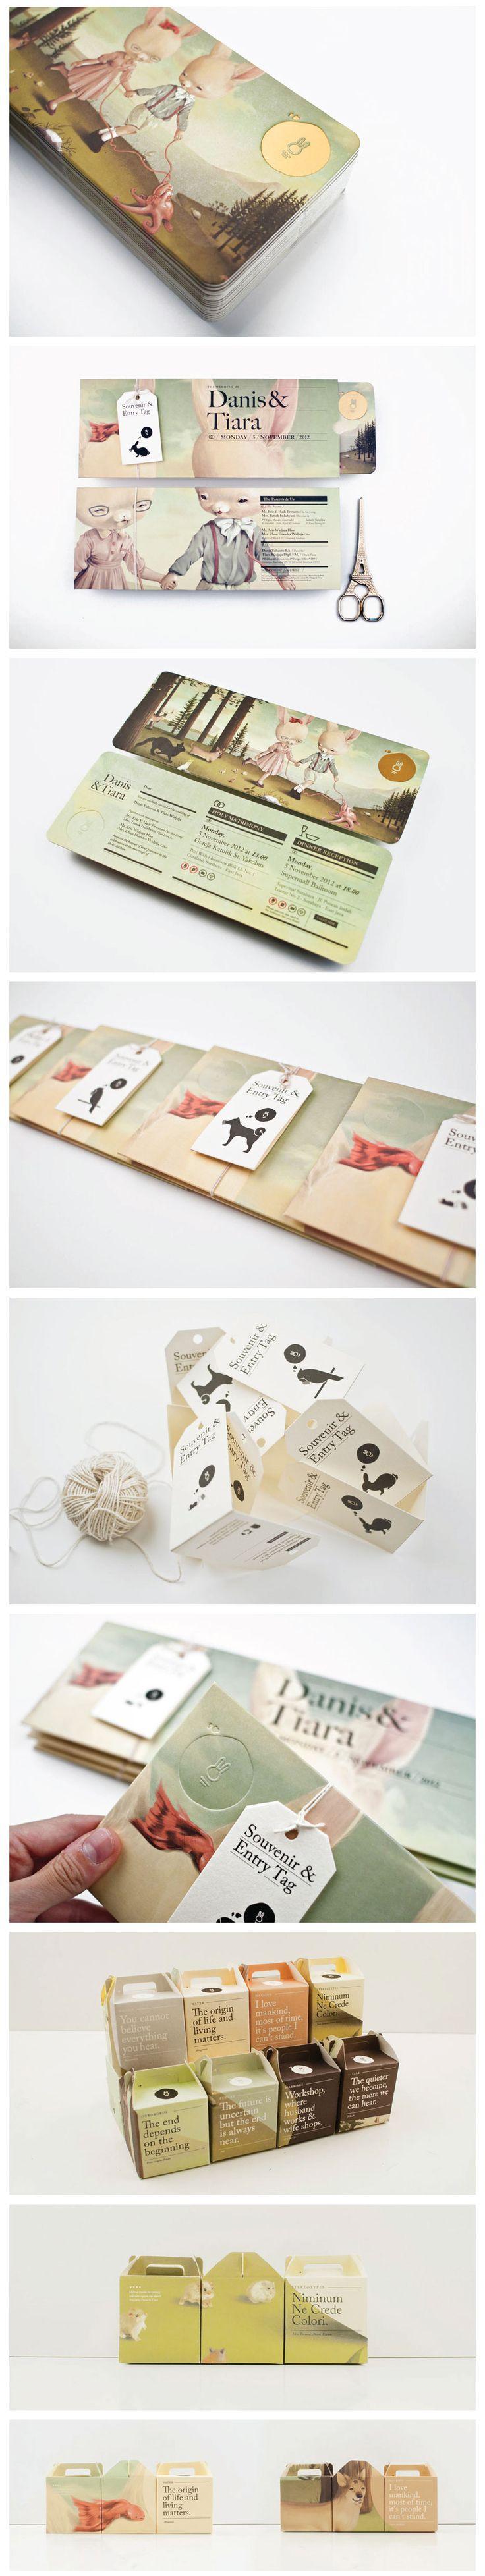 @Paggie Tsai Tsai Yu. #packaging #branding #marketing PD